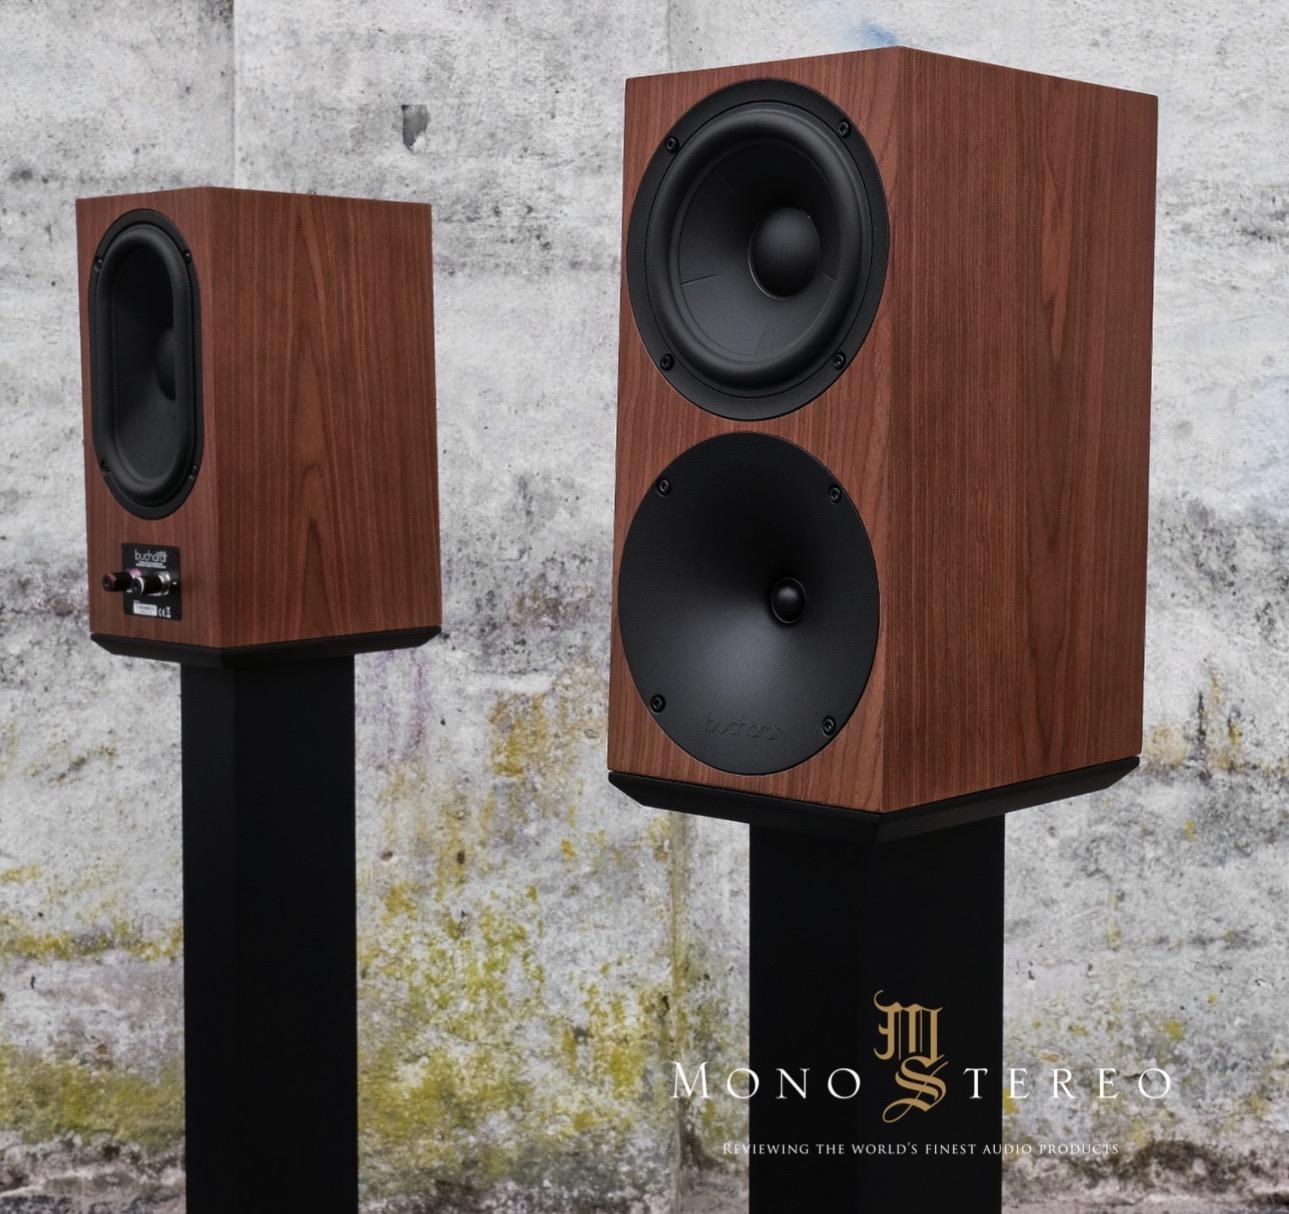 Mono and Stereo High-End Audio Magazine: NEW BUCHARDT AUDIO S400